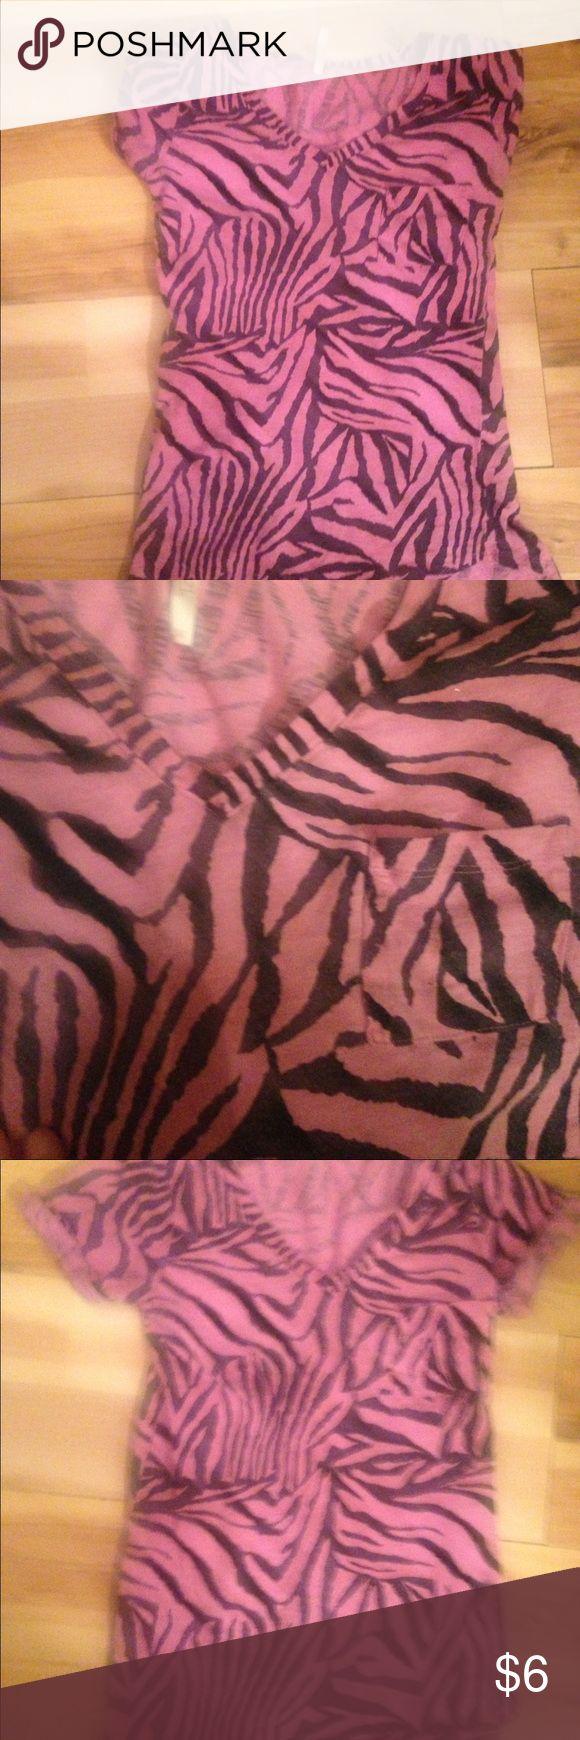 Women's animal print top size medium Pink zebra print women's top size medium Rue 21 Tops Tees - Short Sleeve